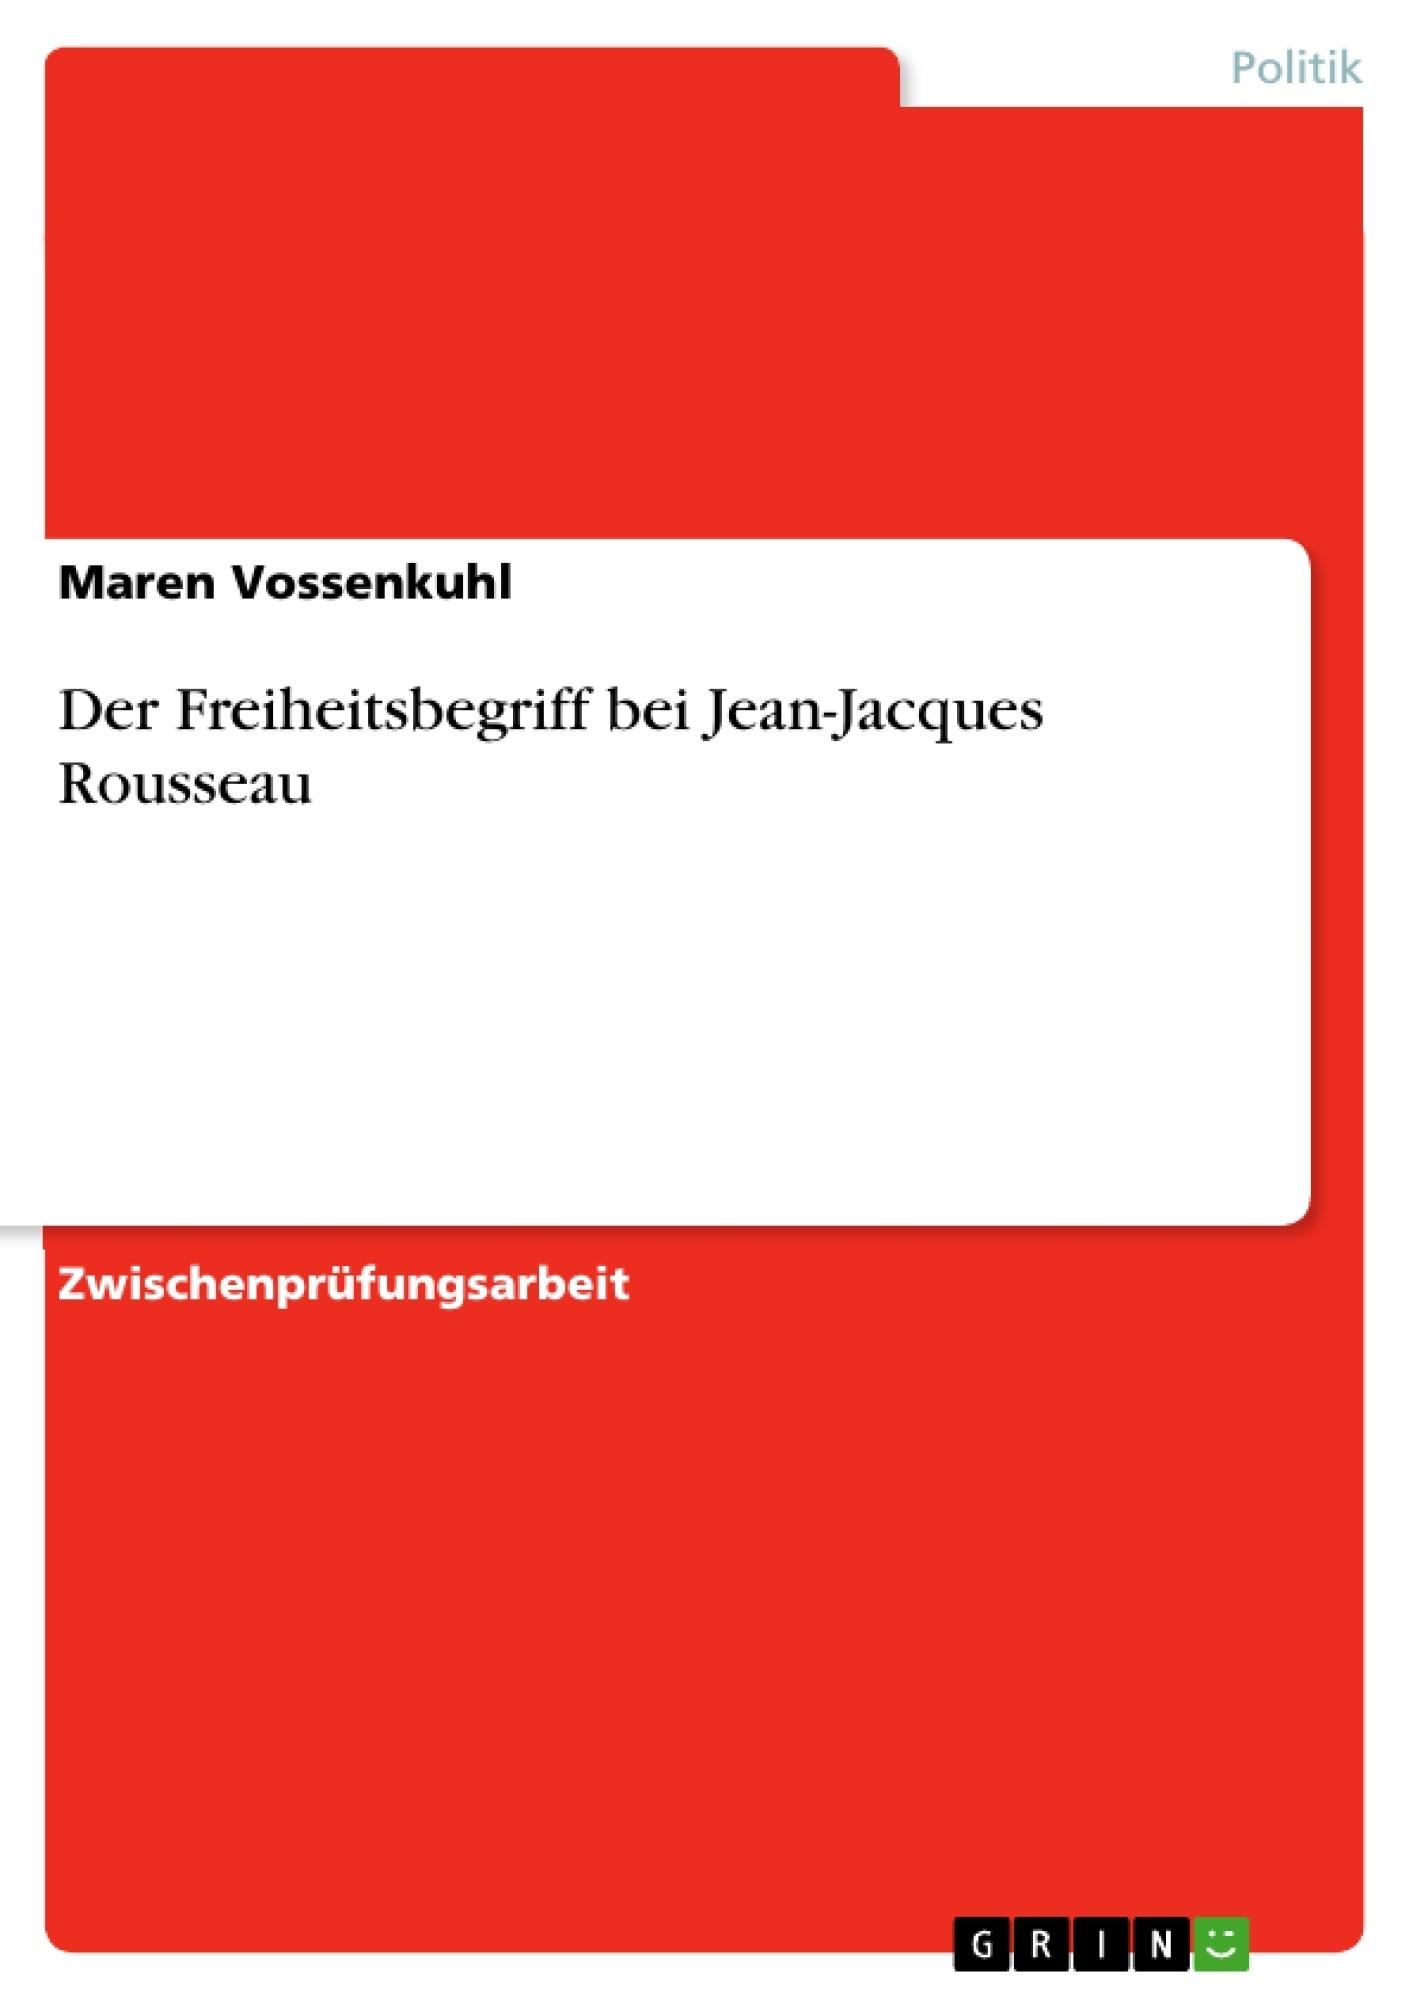 Titel: Der Freiheitsbegriff bei Jean-Jacques Rousseau